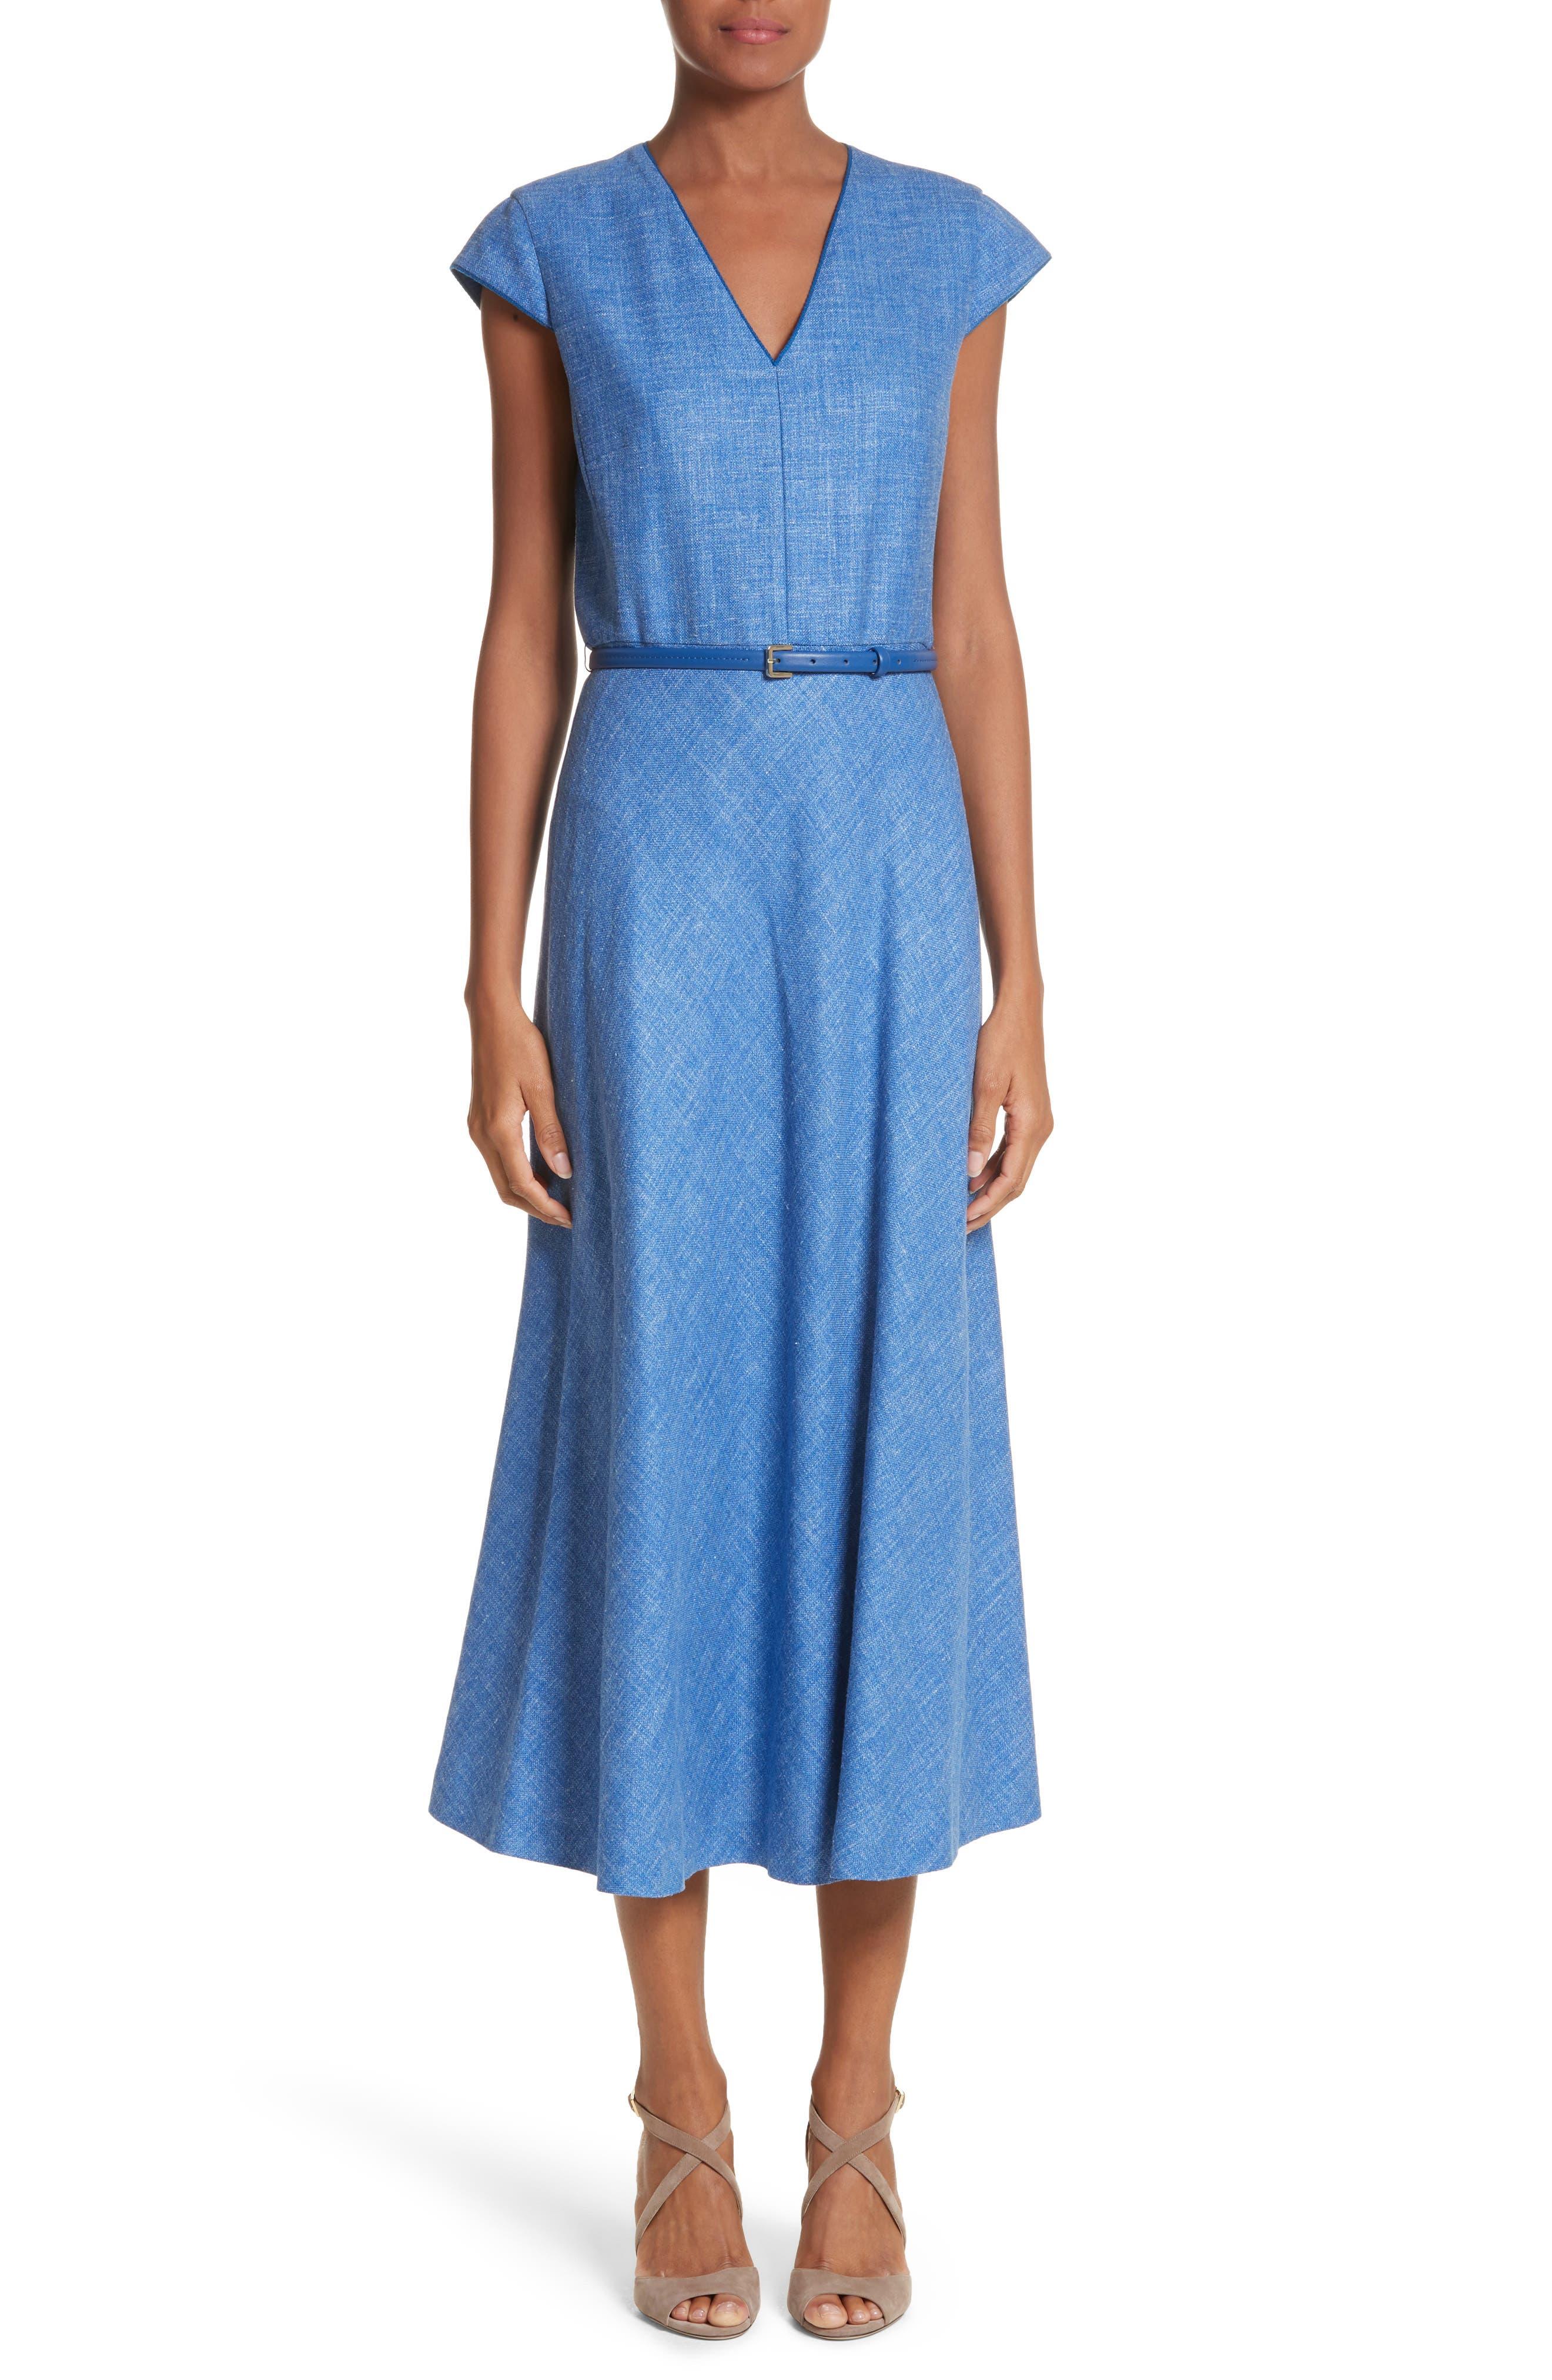 Caramba Silk, Linen & Wool Midi Dress,                             Main thumbnail 1, color,                             Cornflower Blue